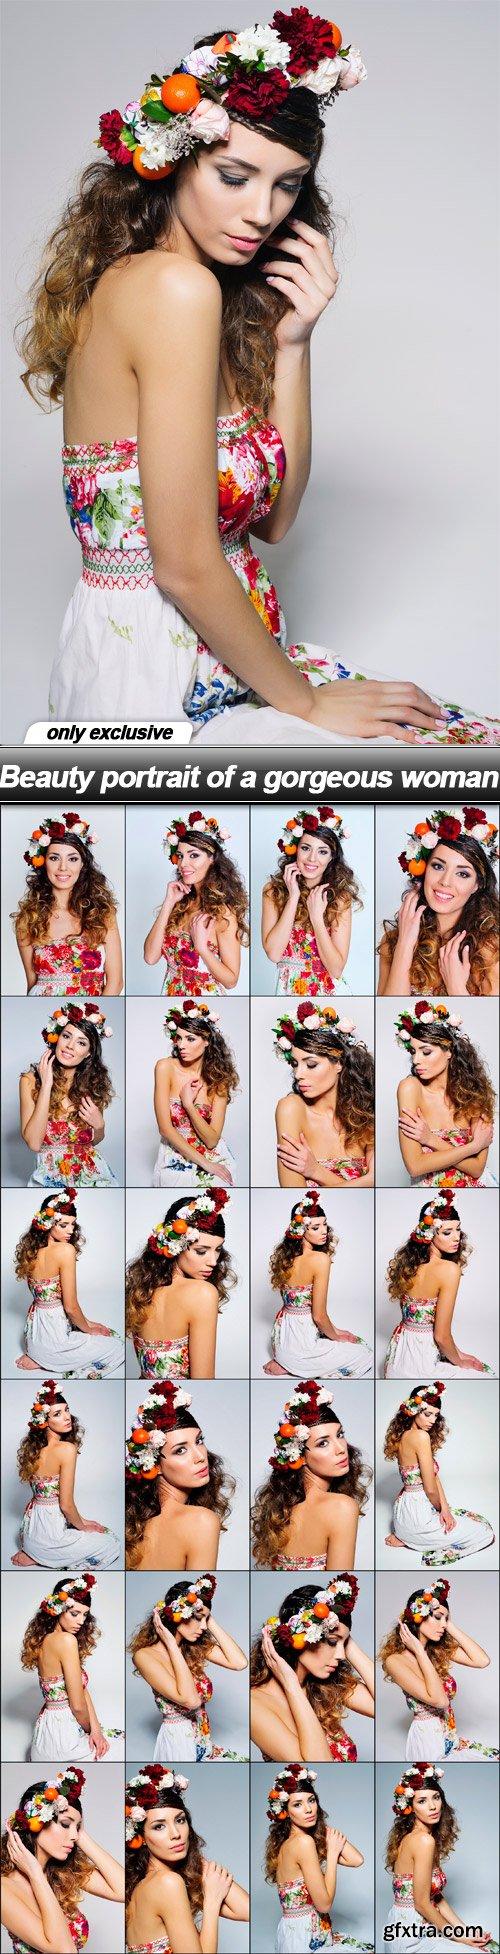 Beauty portrait of a gorgeous woman - 25 UHQ JPEG